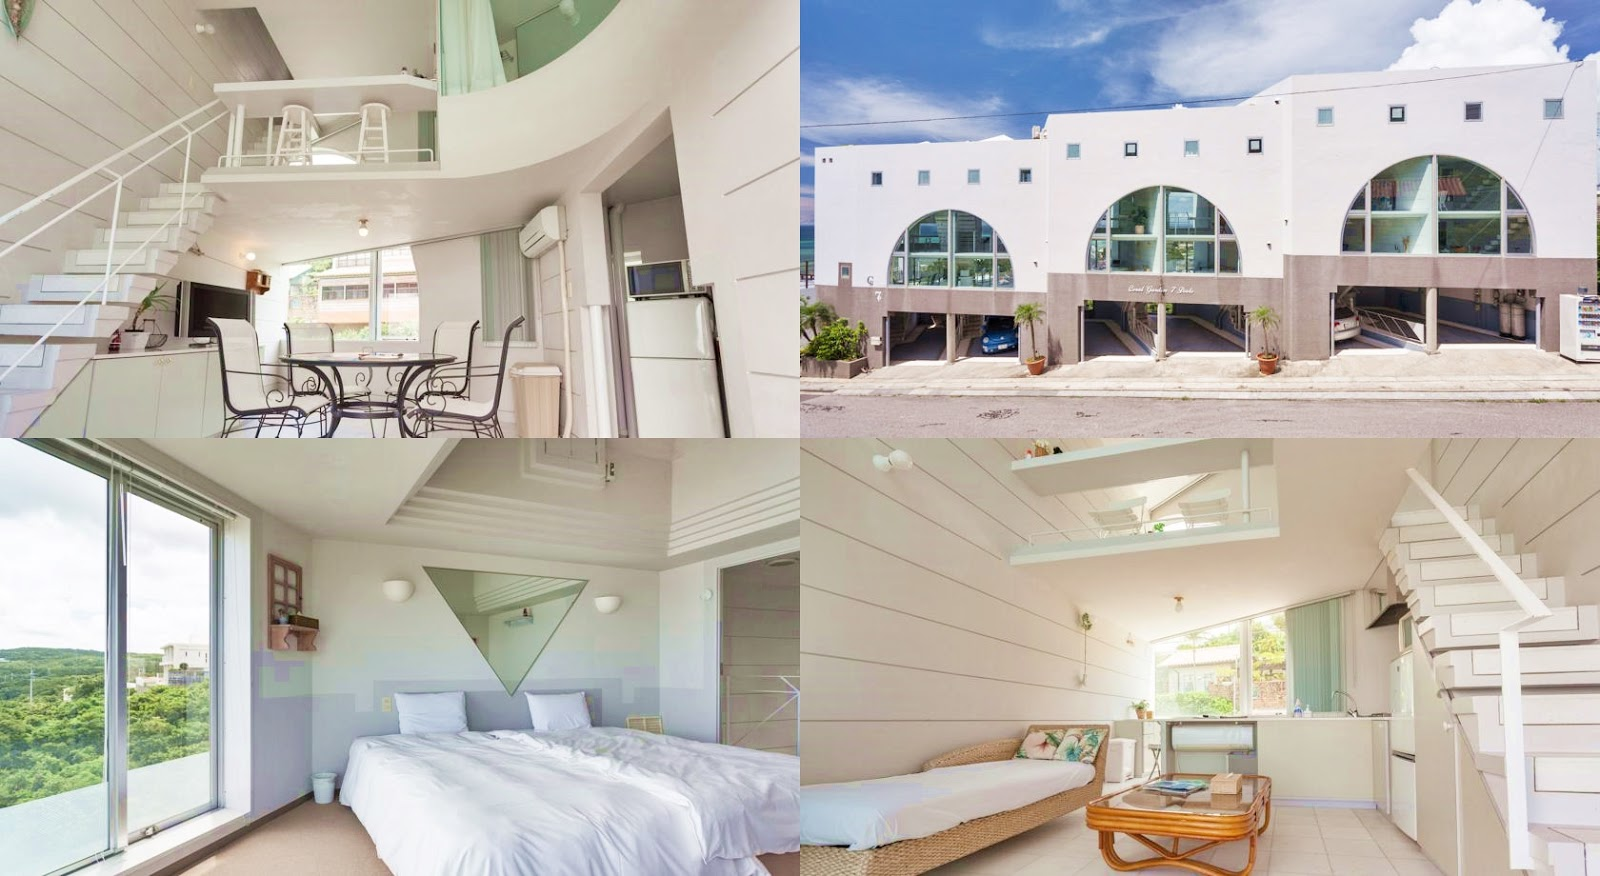 沖繩-住宿-推薦-珊瑚花園七池公寓酒店-Coral-Garden-7-Pools-Okinawa-hotel-recommendation